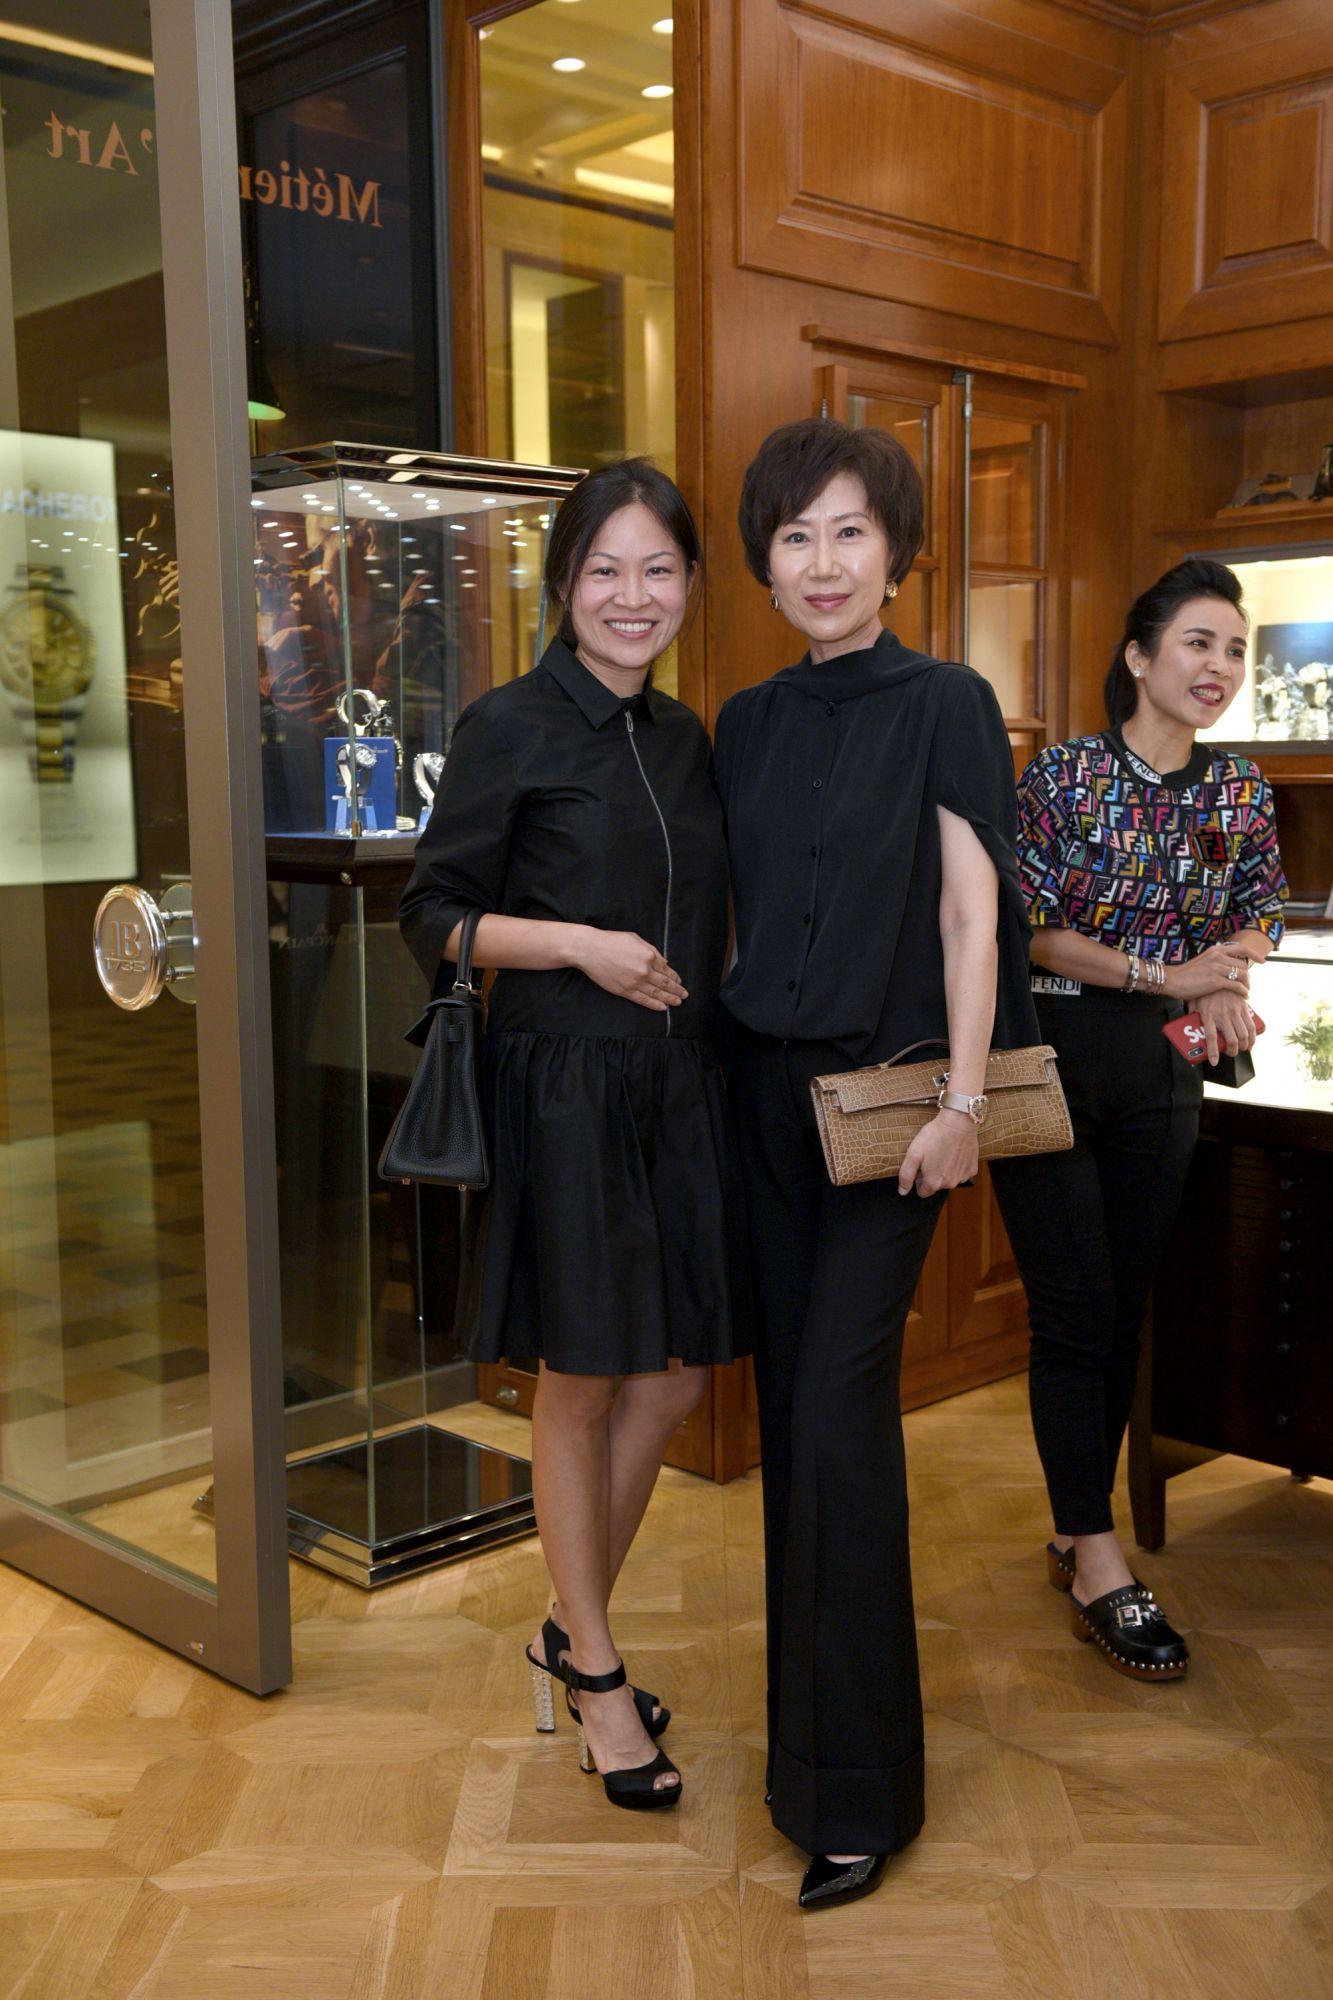 Sonia Ong, Nancy Ong, Fanty Soenardy